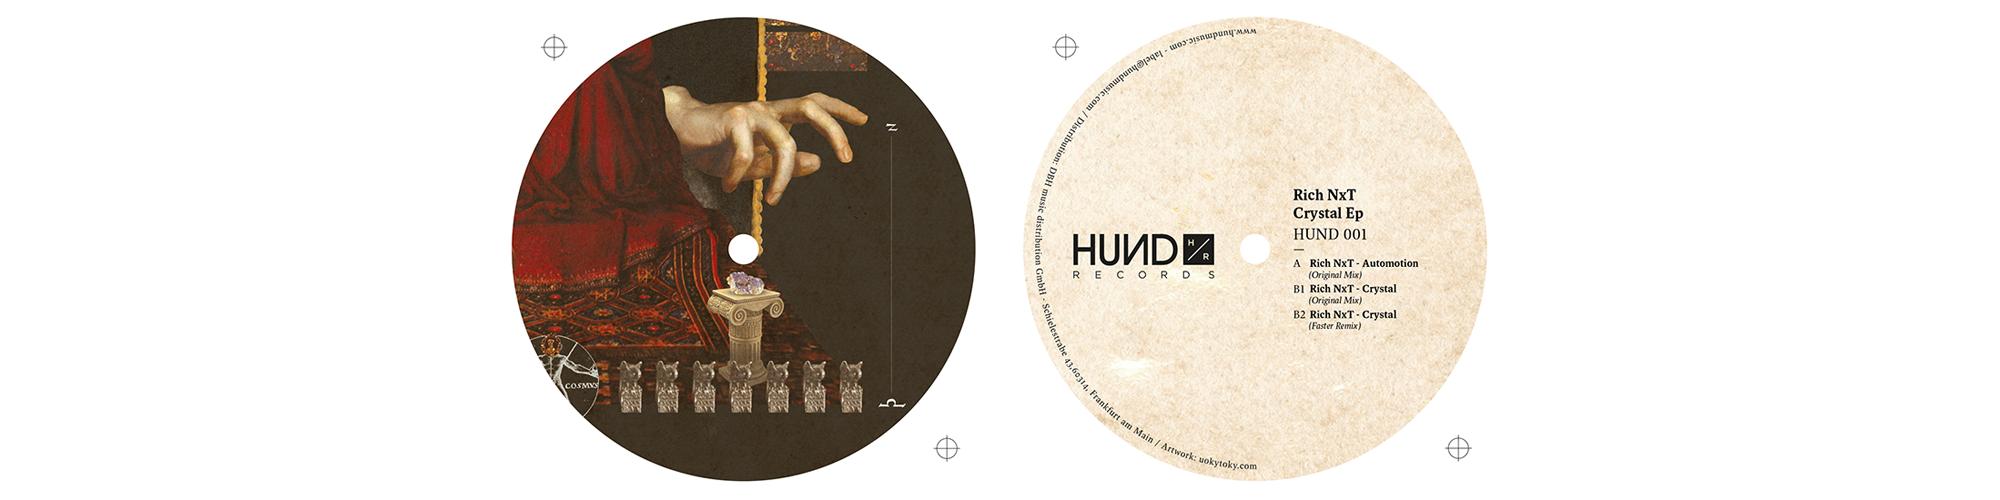 slider-hund-records-01